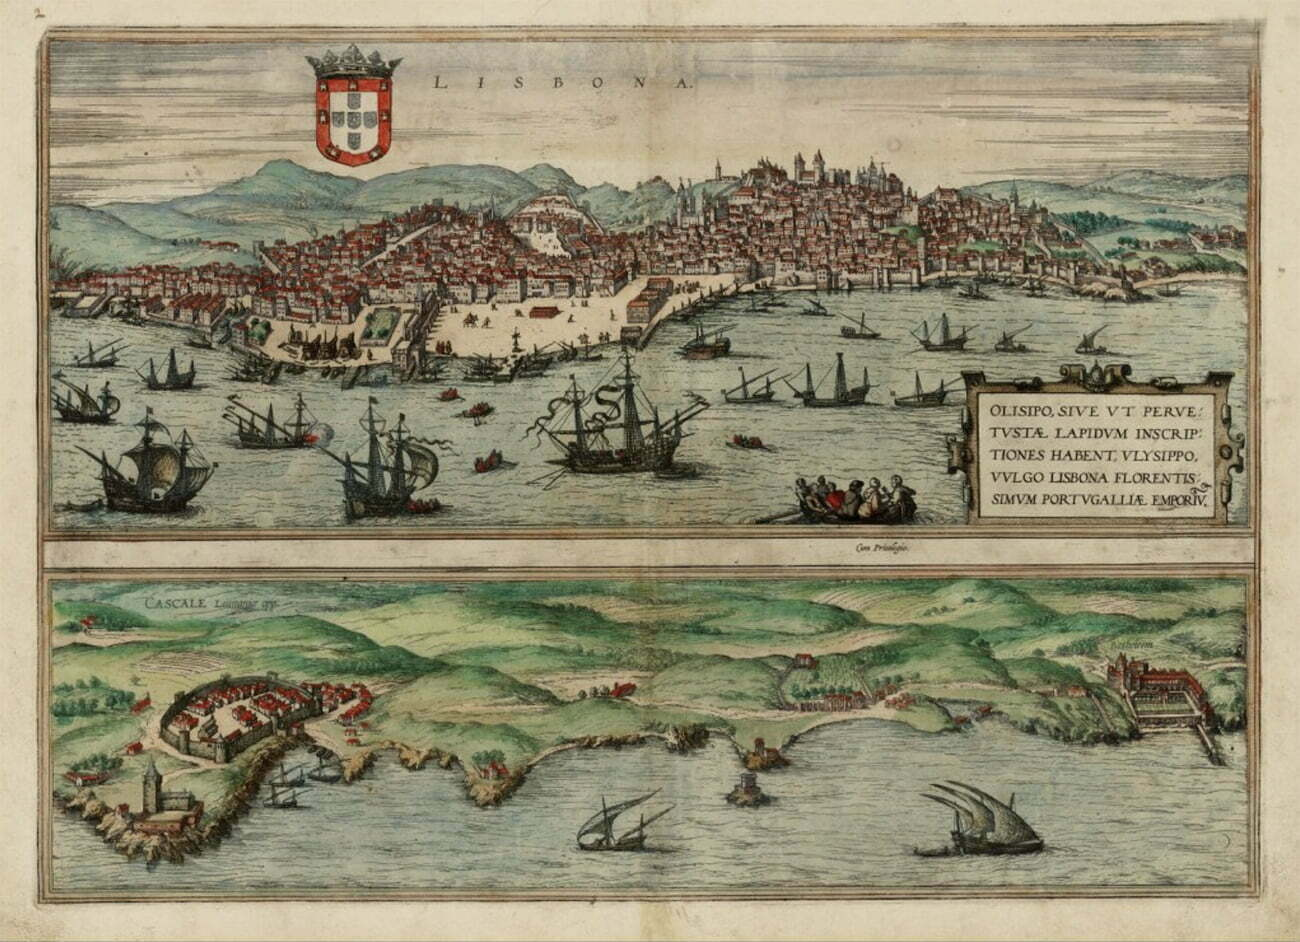 Gravura de Lisboa, século 16.